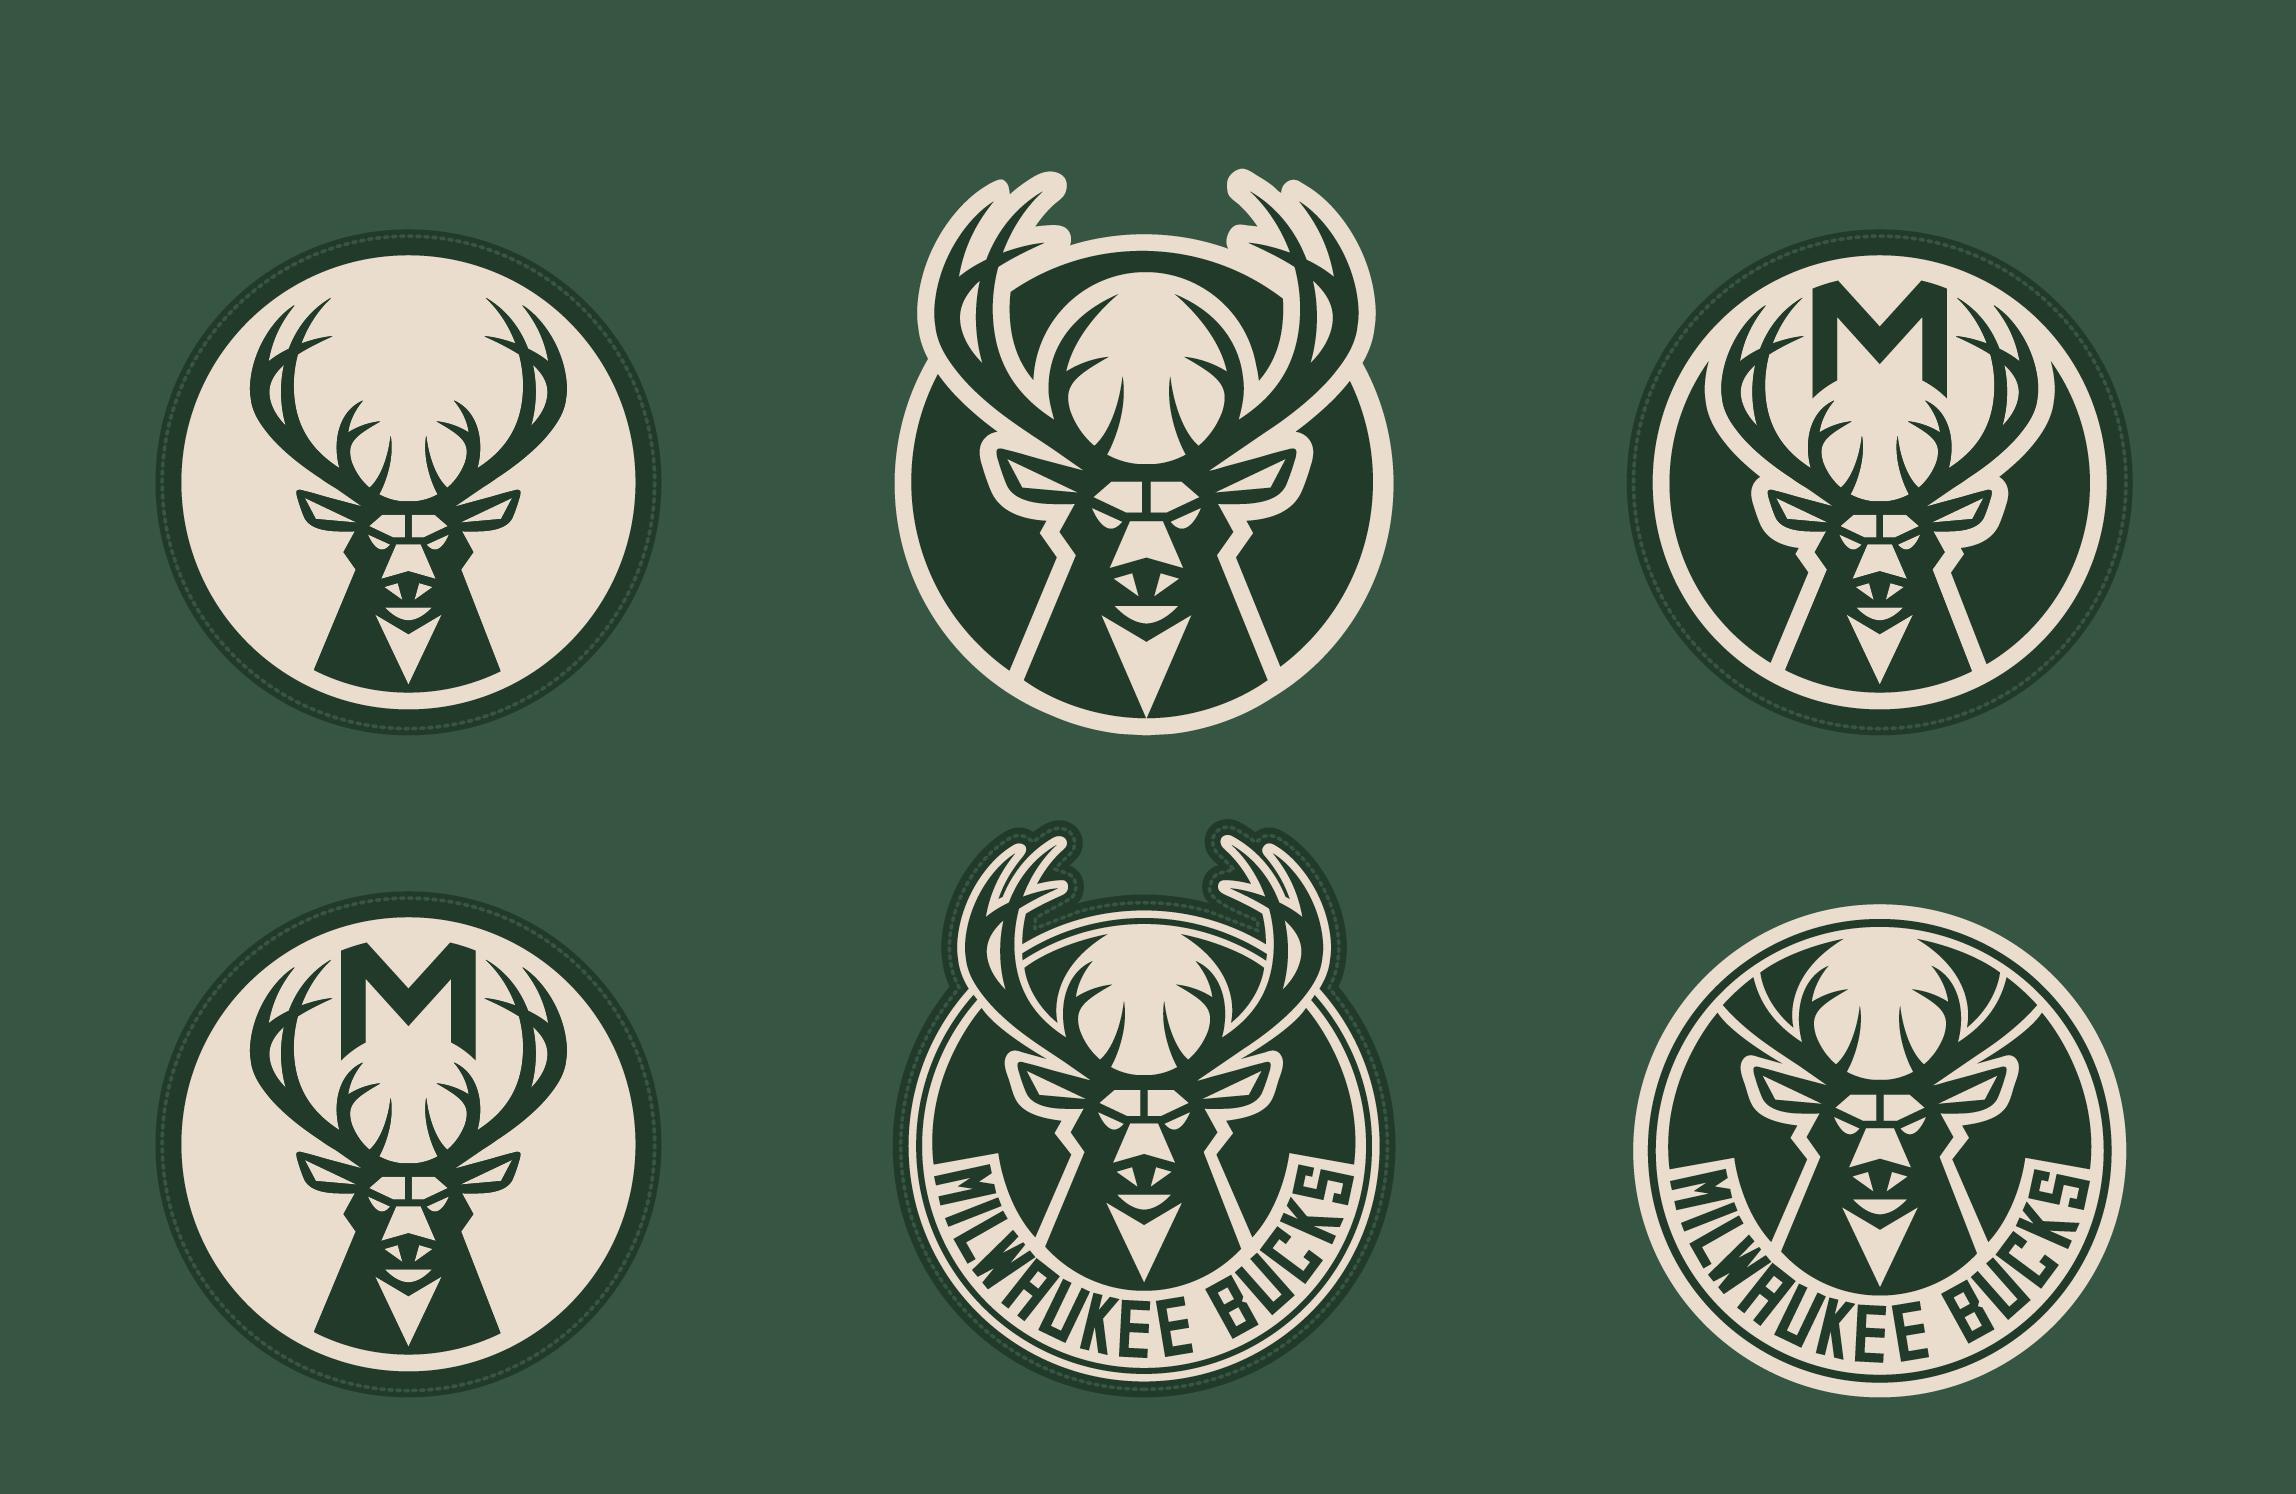 Milwaukee Bucks Wallpapers Sports Hq Milwaukee Bucks Pictures 4k Wallpapers 2019